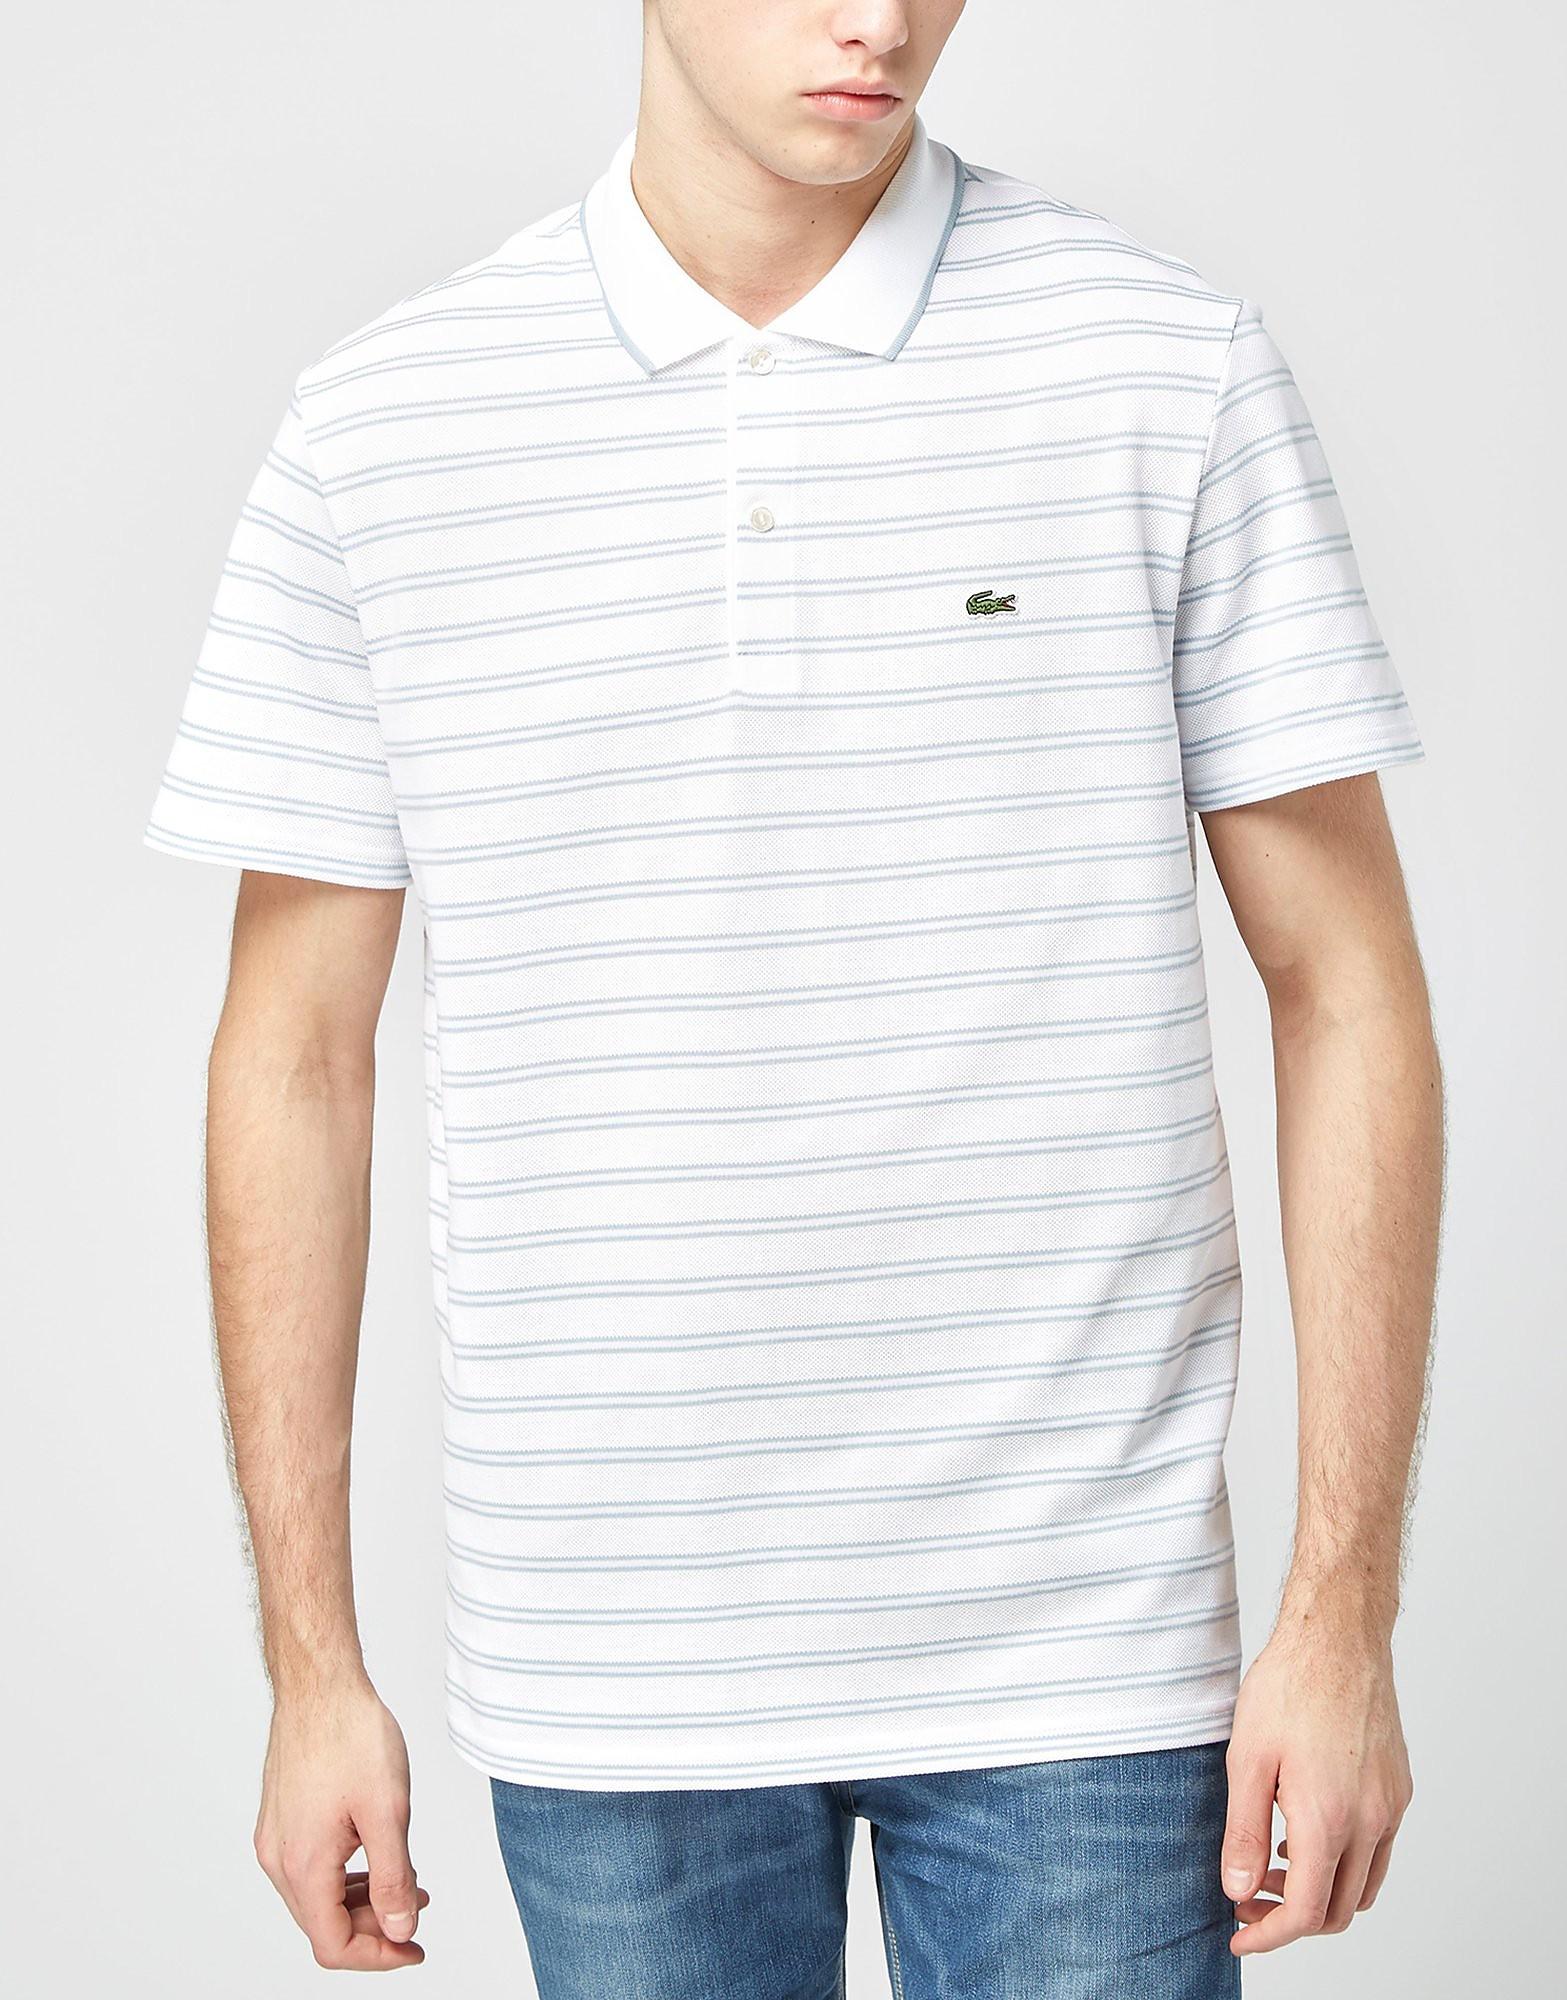 Lacoste Stripe Jersey Polo Shirt